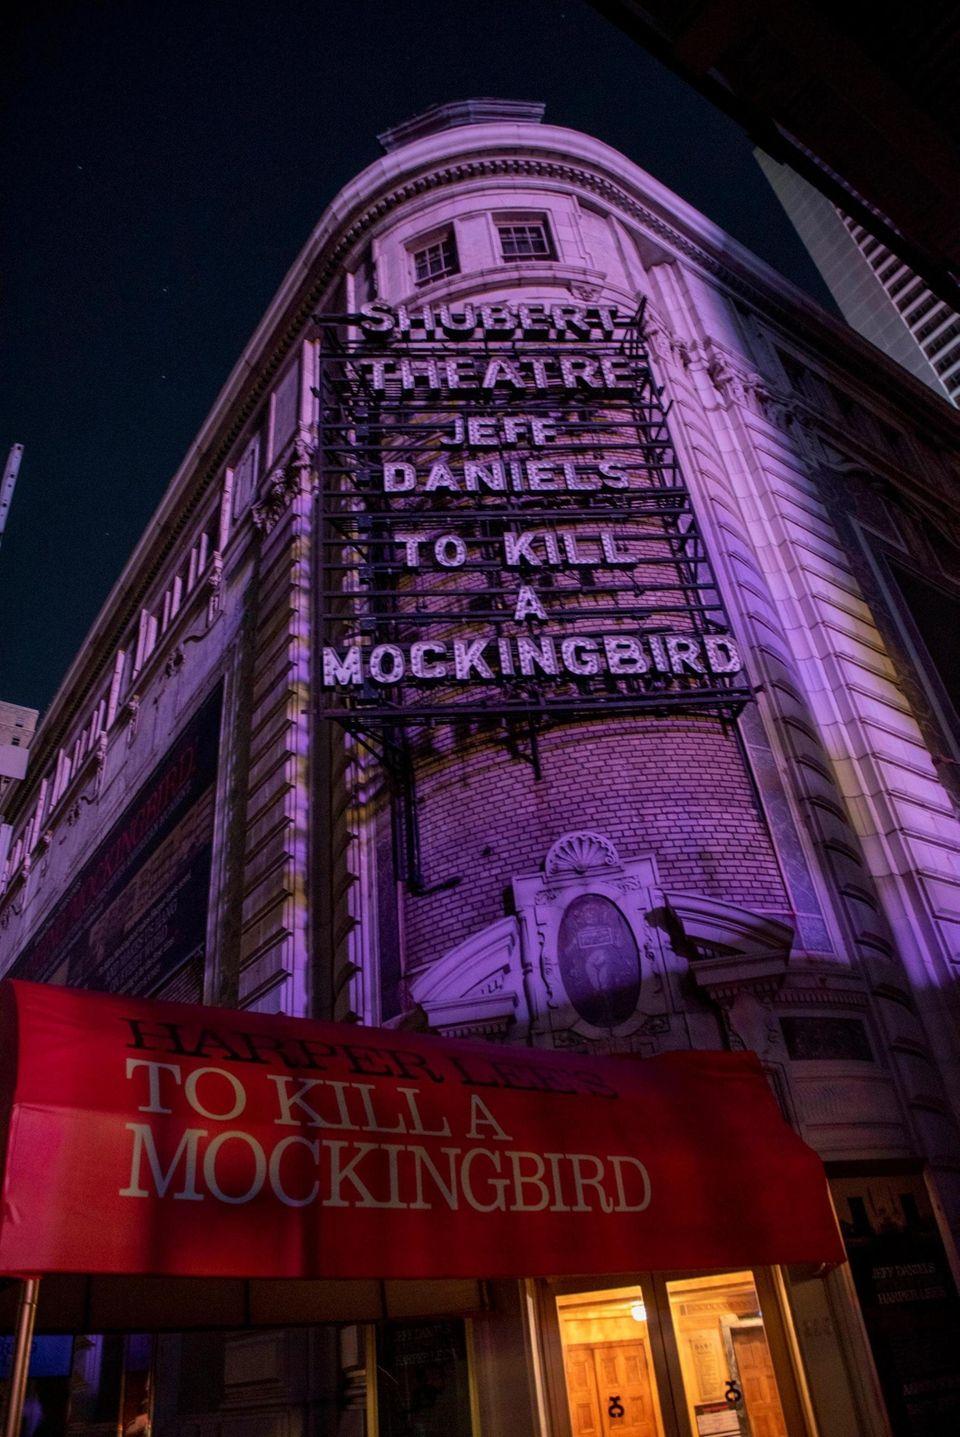 """To Kill a Mockingbird"" marquee was also dark."